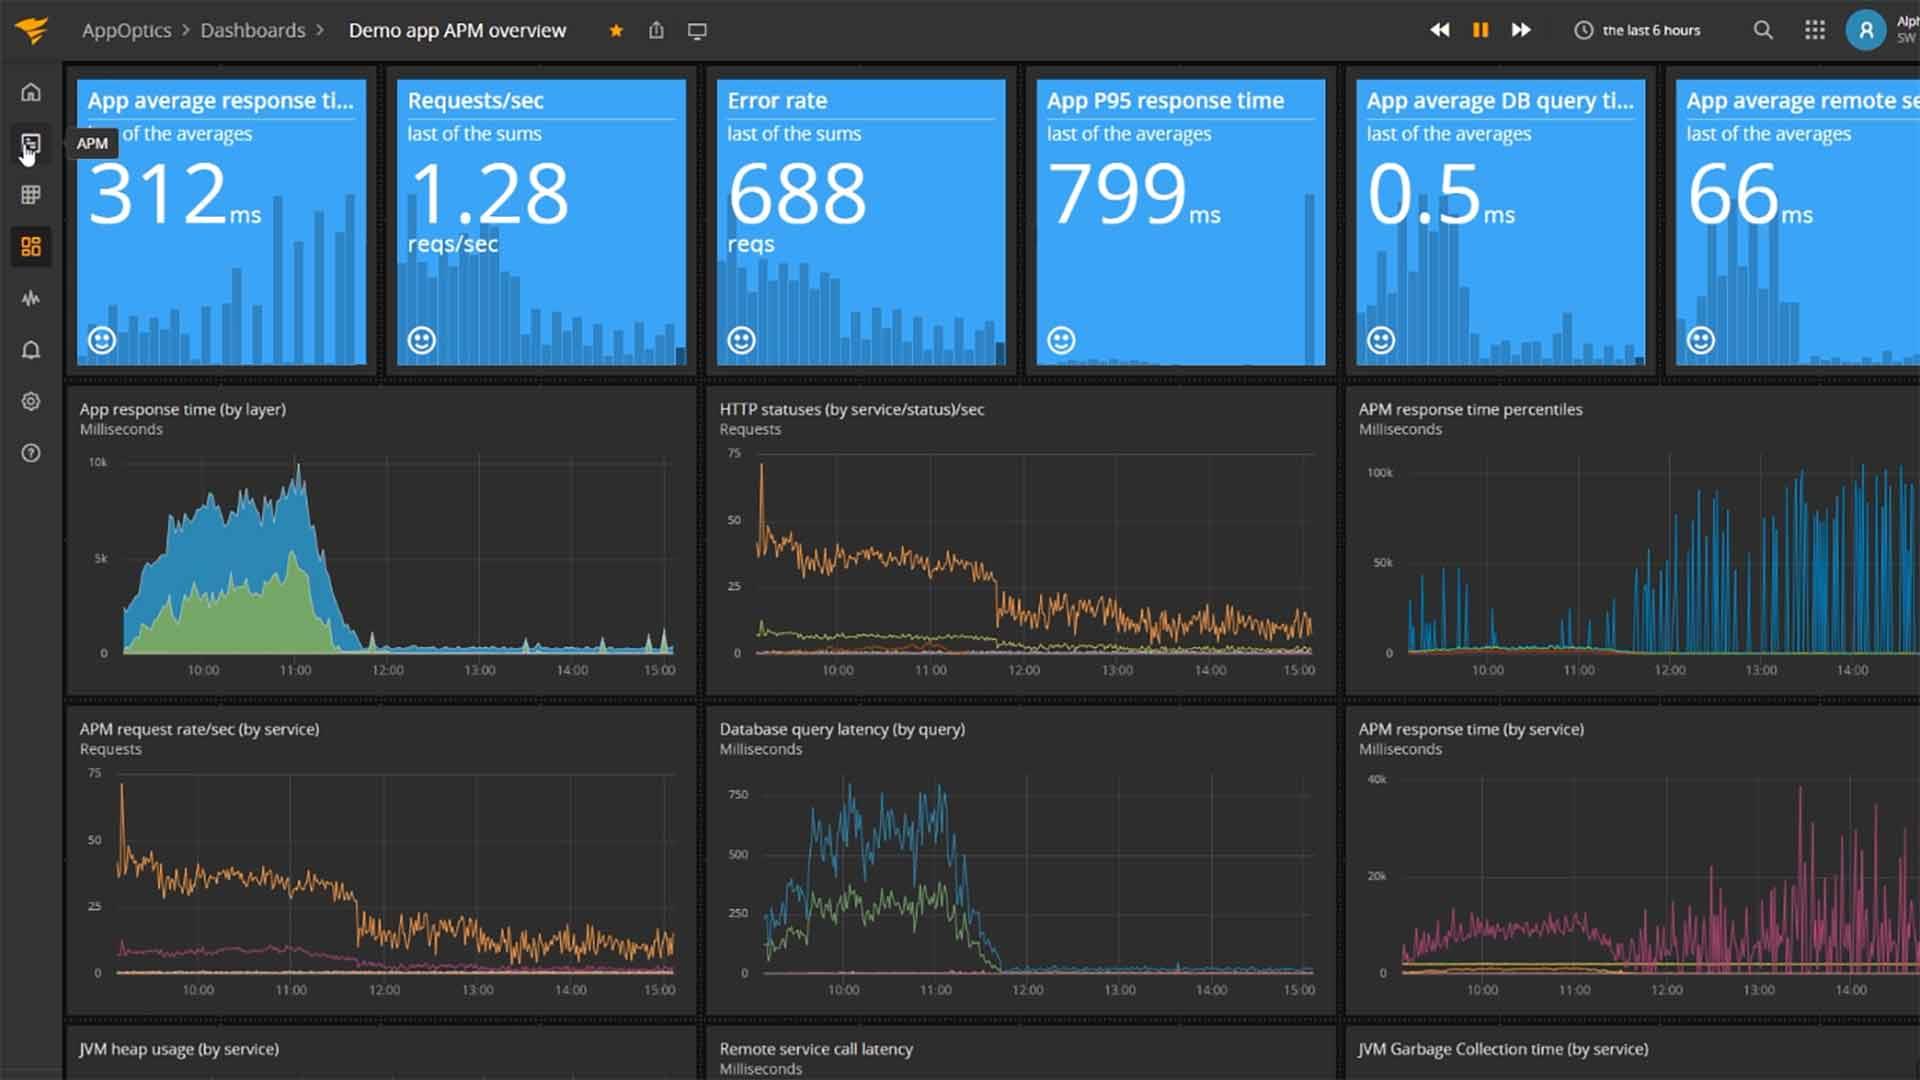 SolarWinds AppOptics Application Performance Management (APM) dashboard